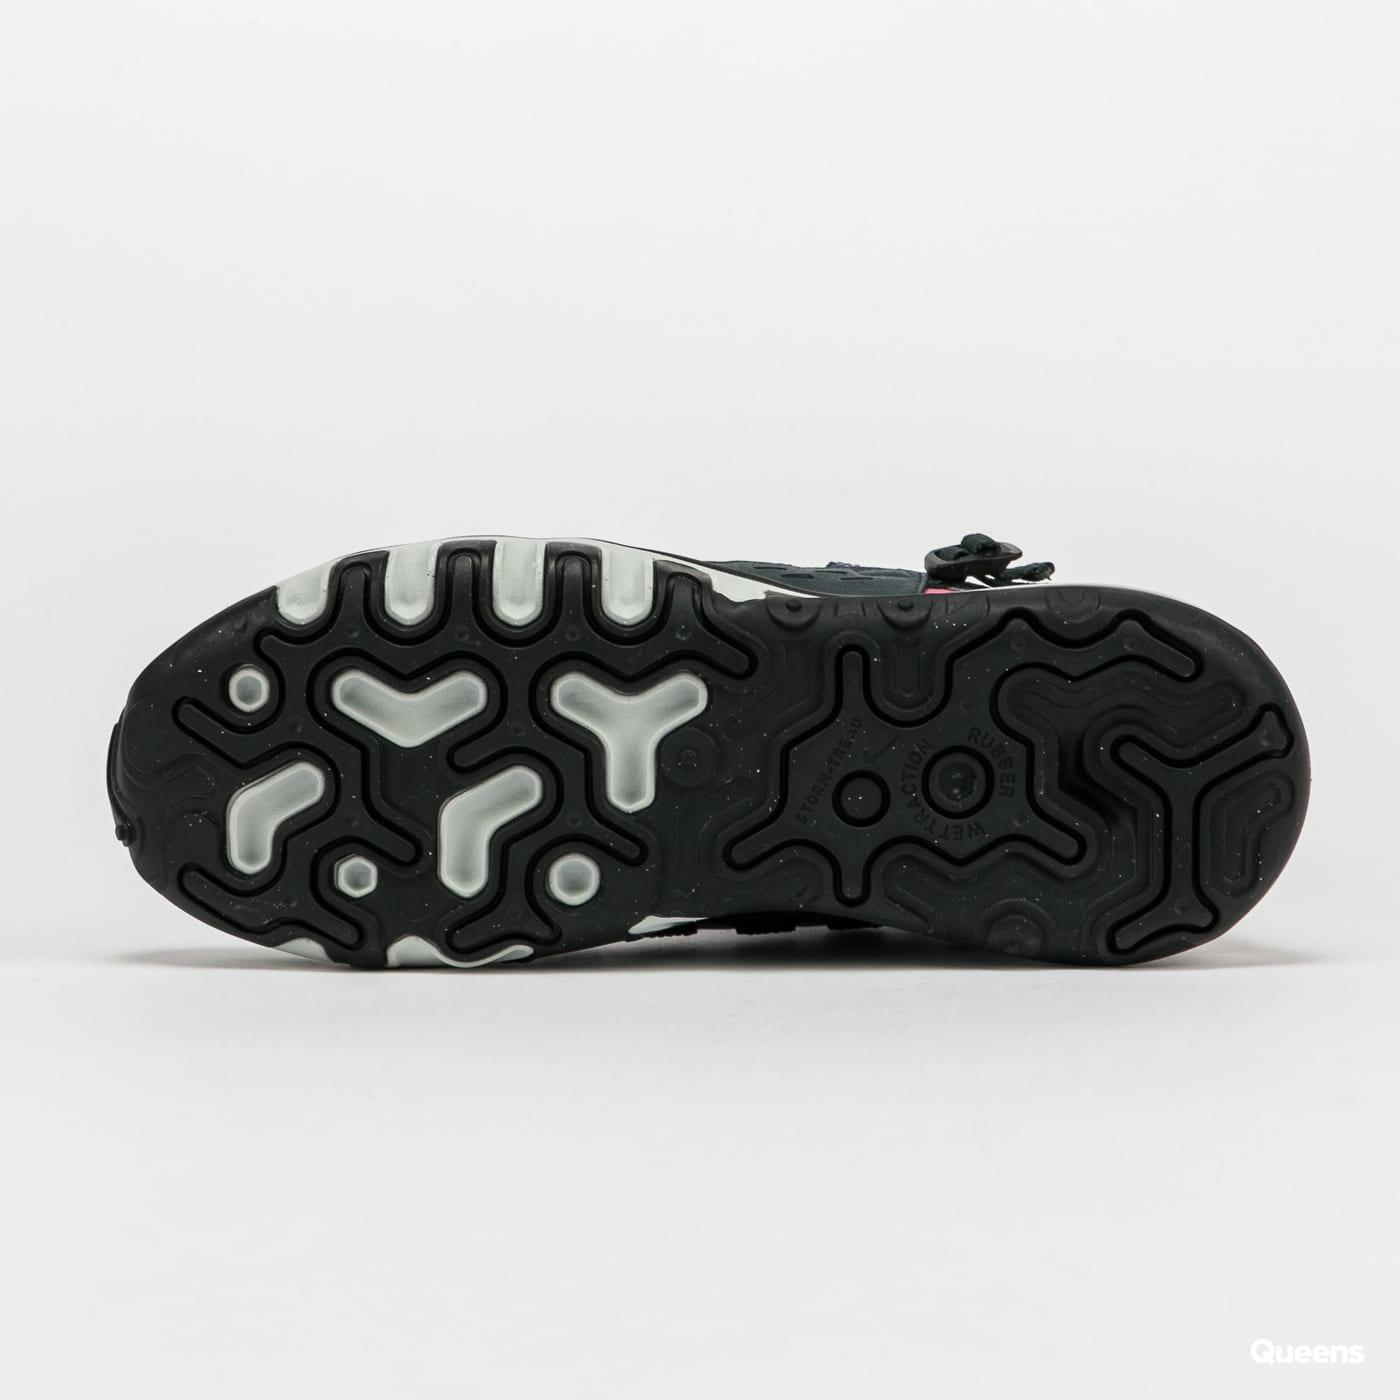 Nike Air Max Vistacape spaweed / desert berry